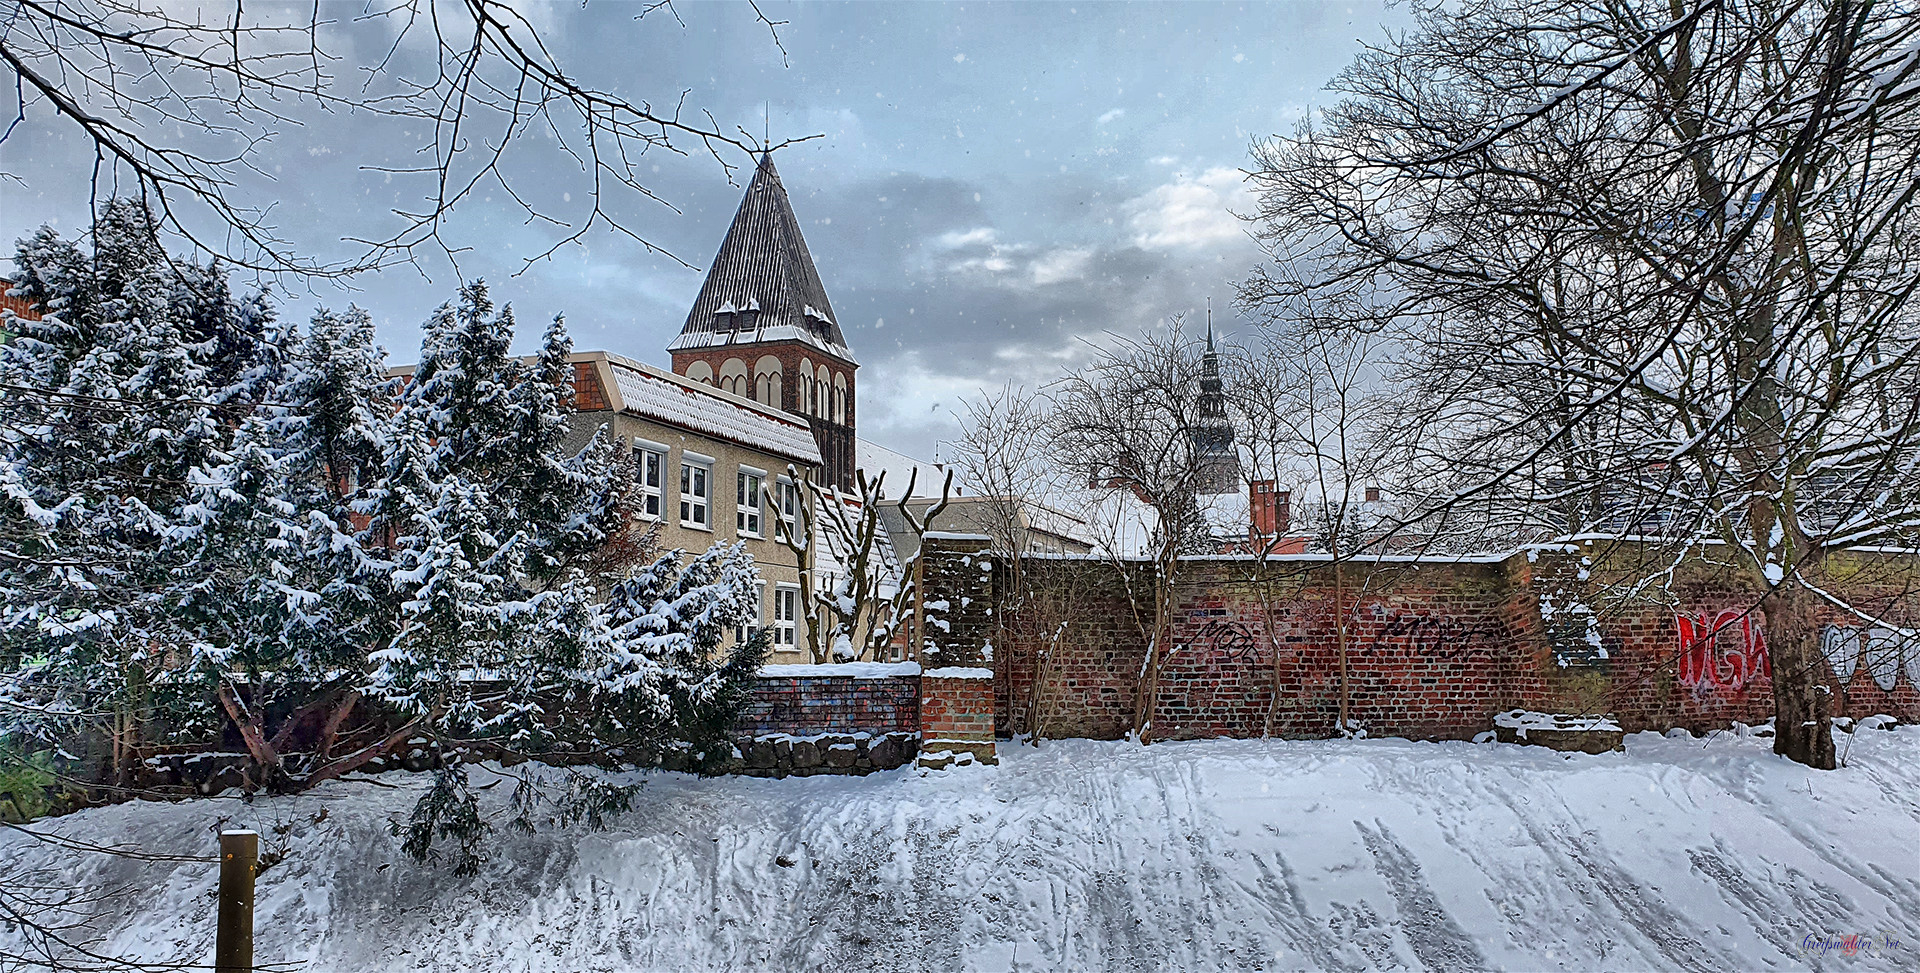 St.-Jacobi-Kirche, Stadtmauer und Dom St. Nikolai